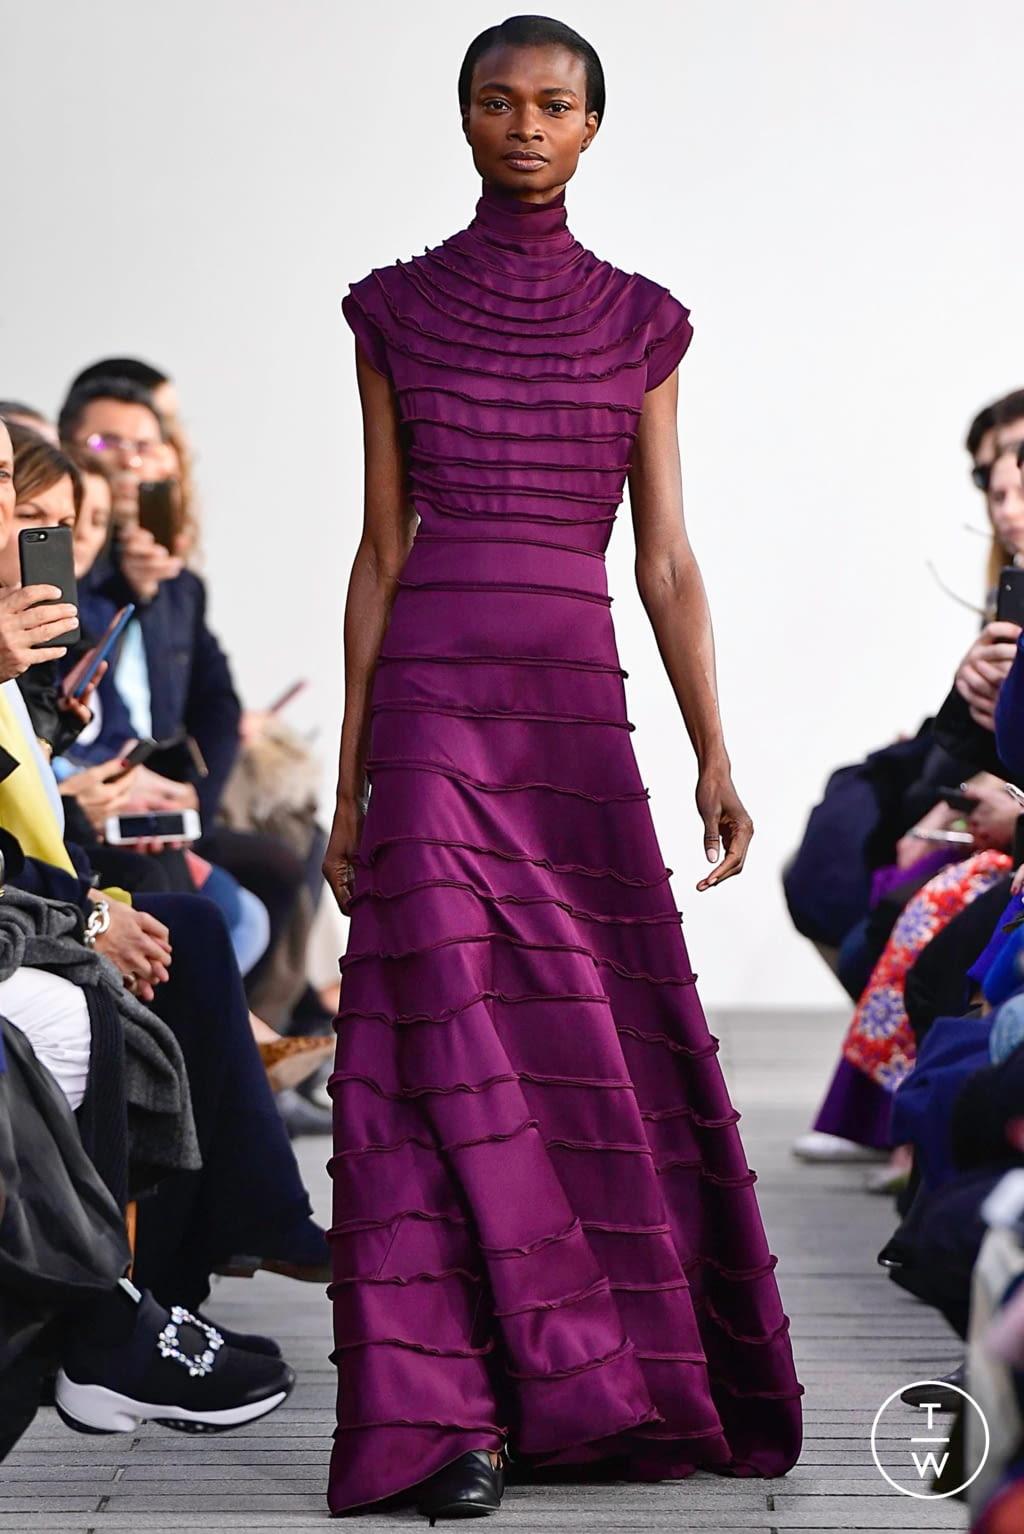 Fashion Week Paris Spring/Summer 2019 look 17 de la collection Maison Rabih Kayrouz couture